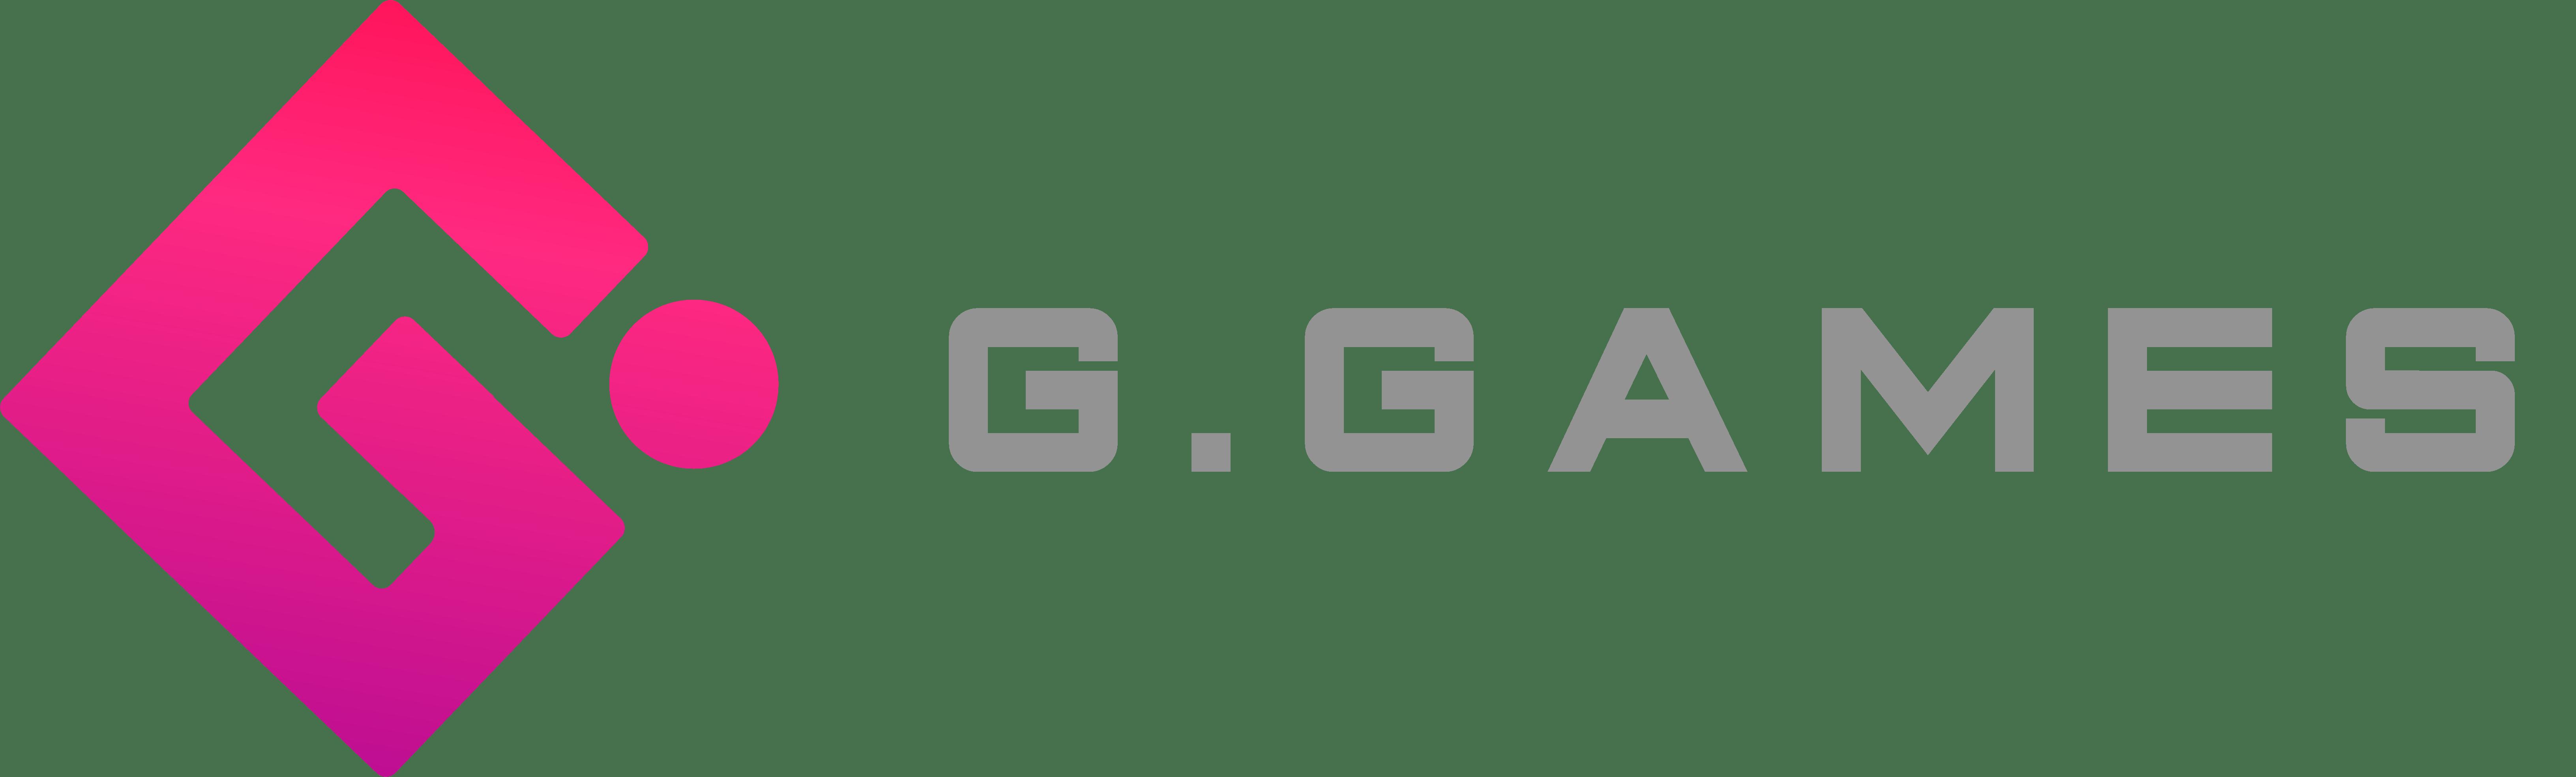 G. Games (Former Gamevy) jogos